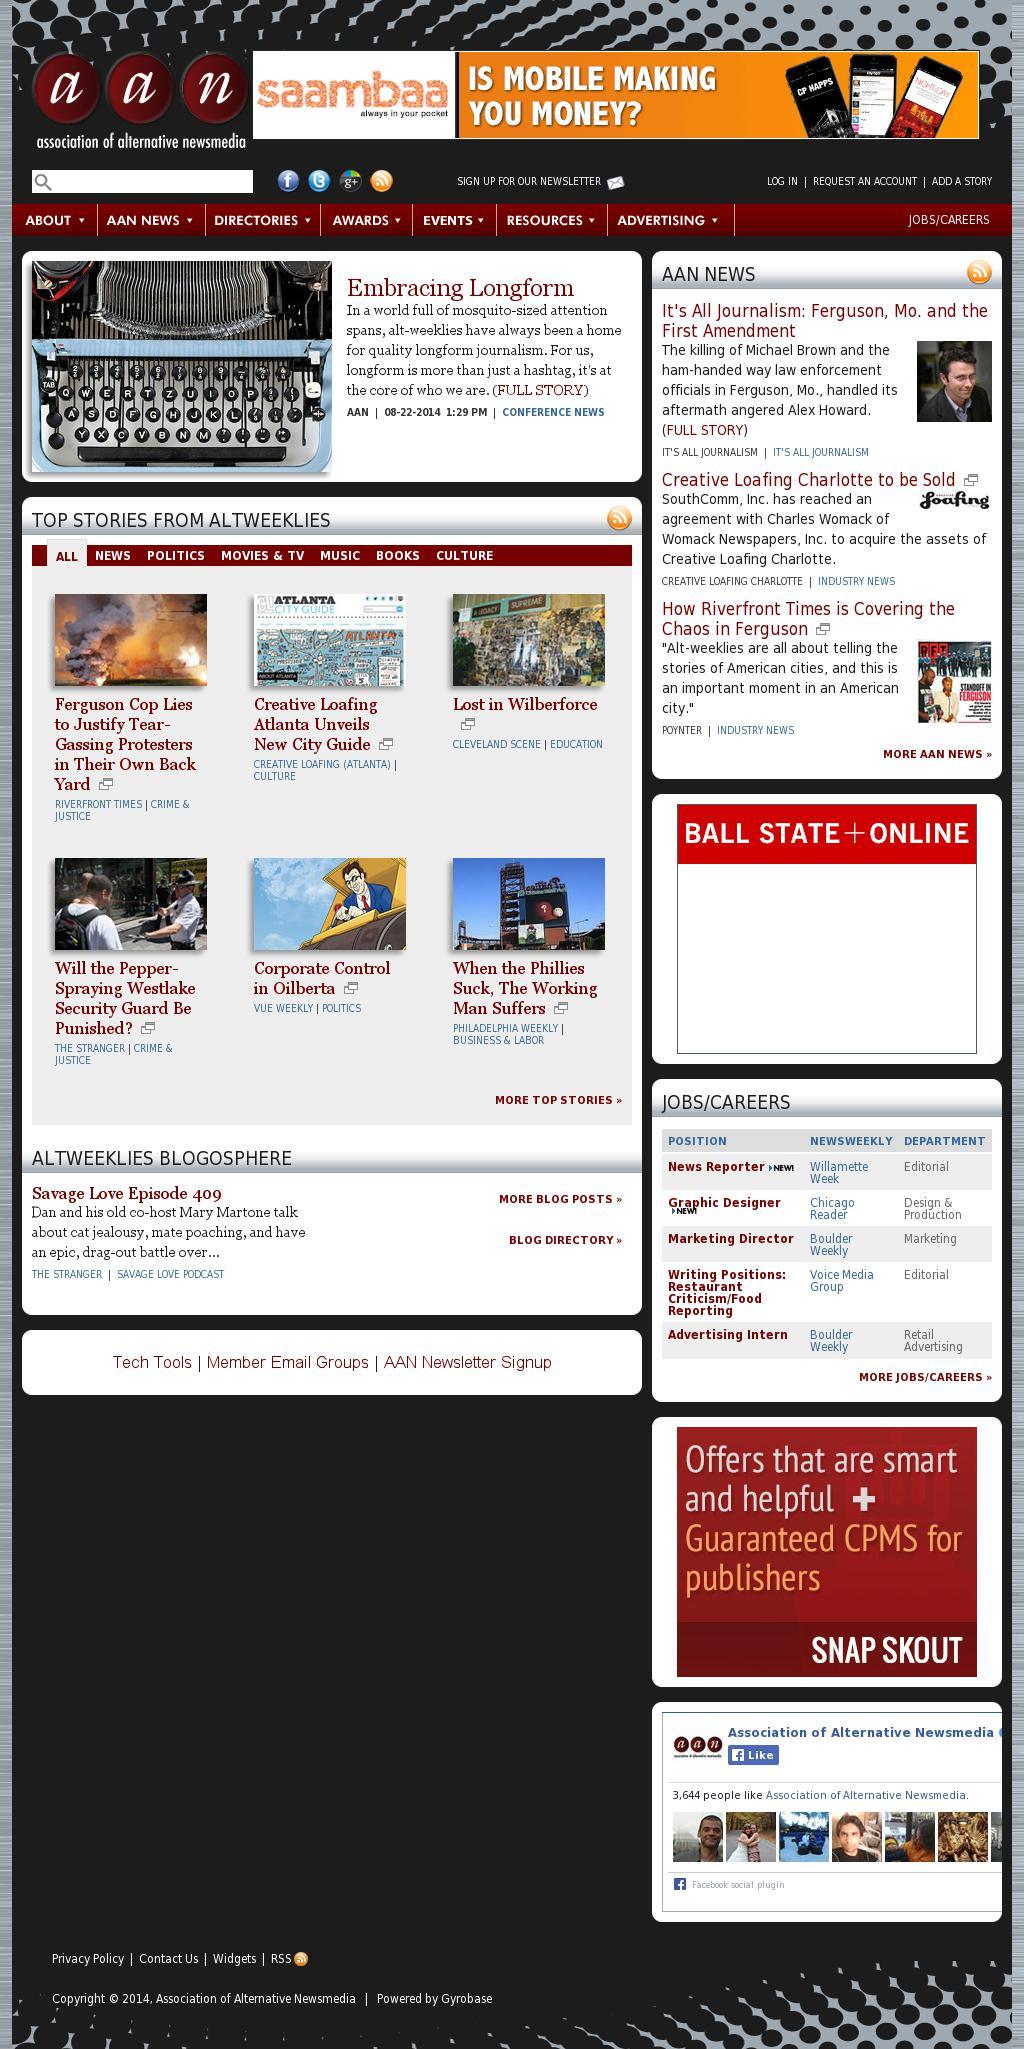 Association of Alternative Newsmedia at Tuesday Aug. 26, 2014, 10 a.m. UTC